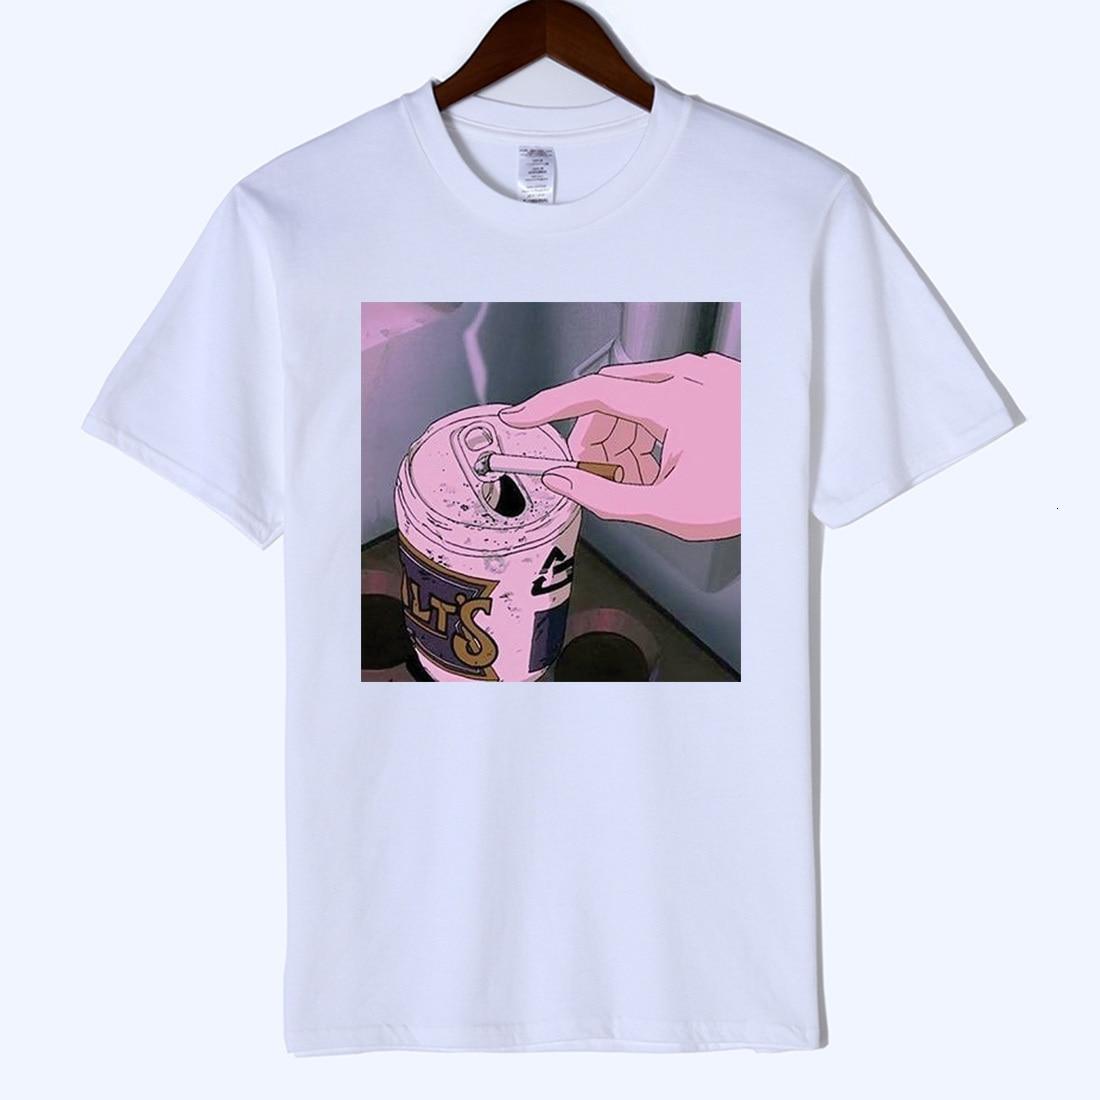 High Quality Arrival Sad Anime Vaporwave Print T Shirt Aesthetic Japan Otaku Mans T-shirt Male Casual Short Sleeve Harajuku